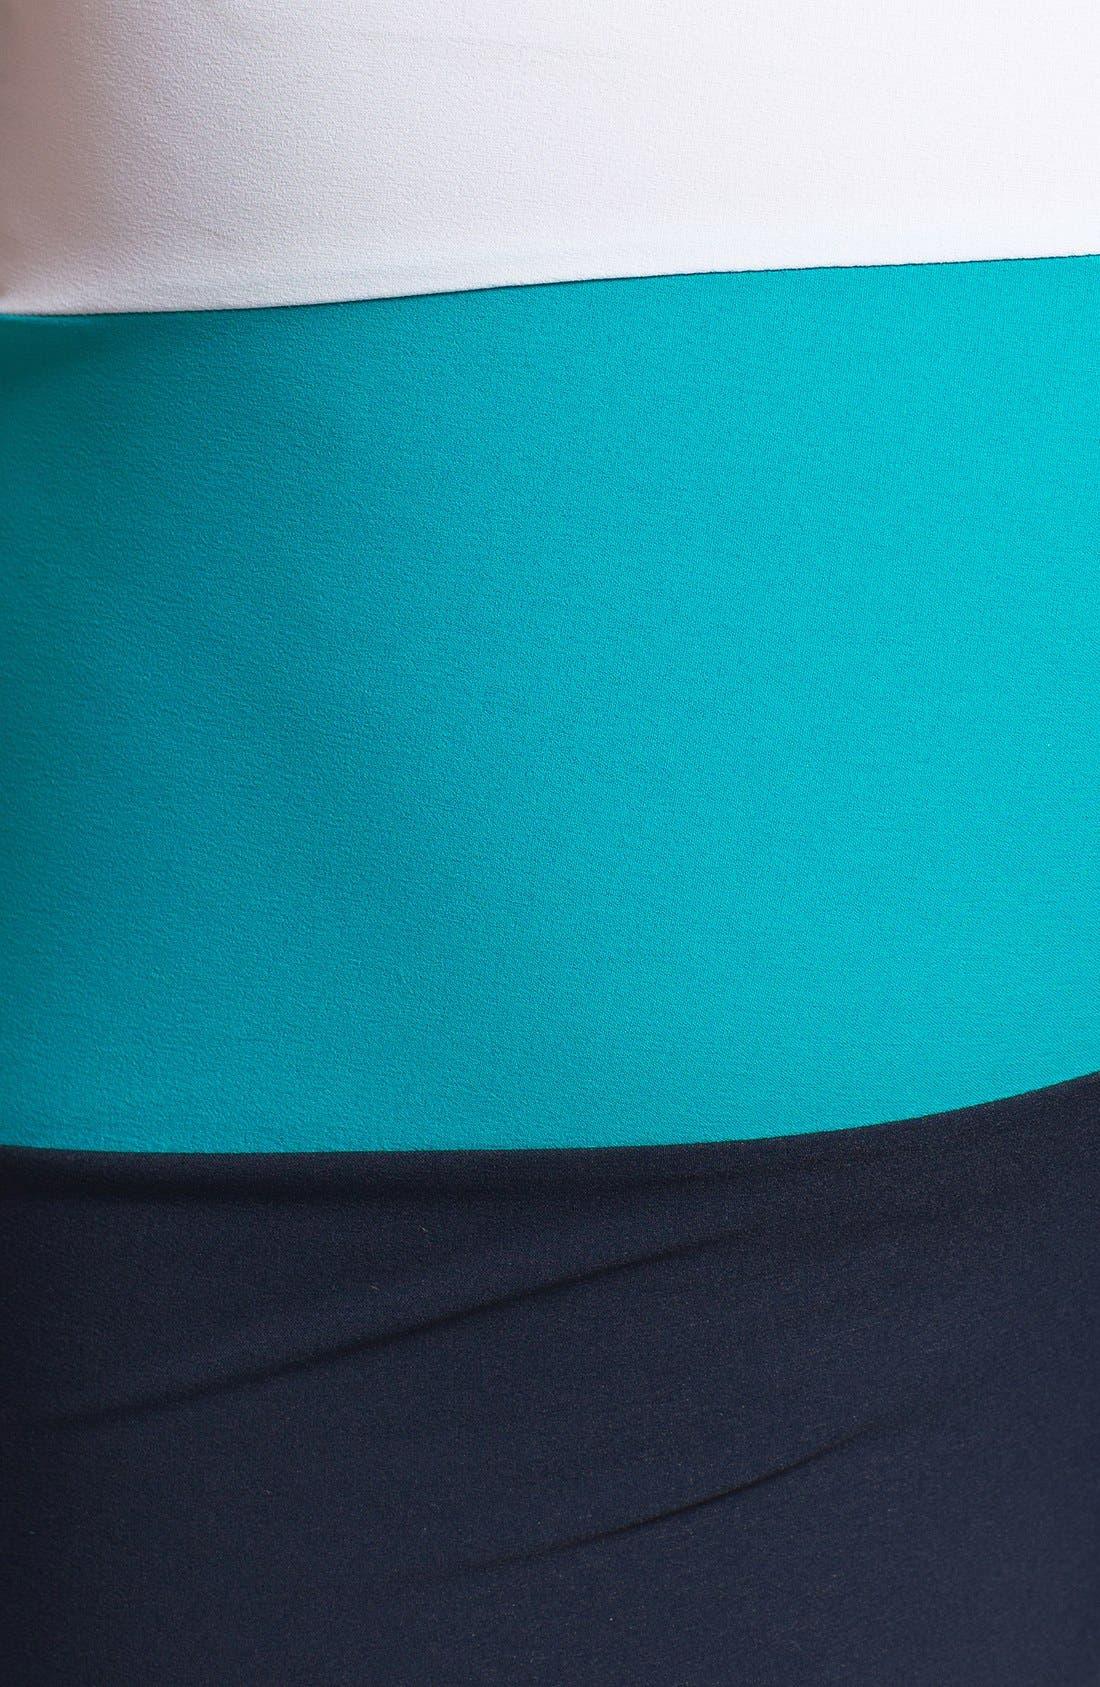 Alternate Image 3  - Speedo® 'Summit' Square Cut Swim Trunks